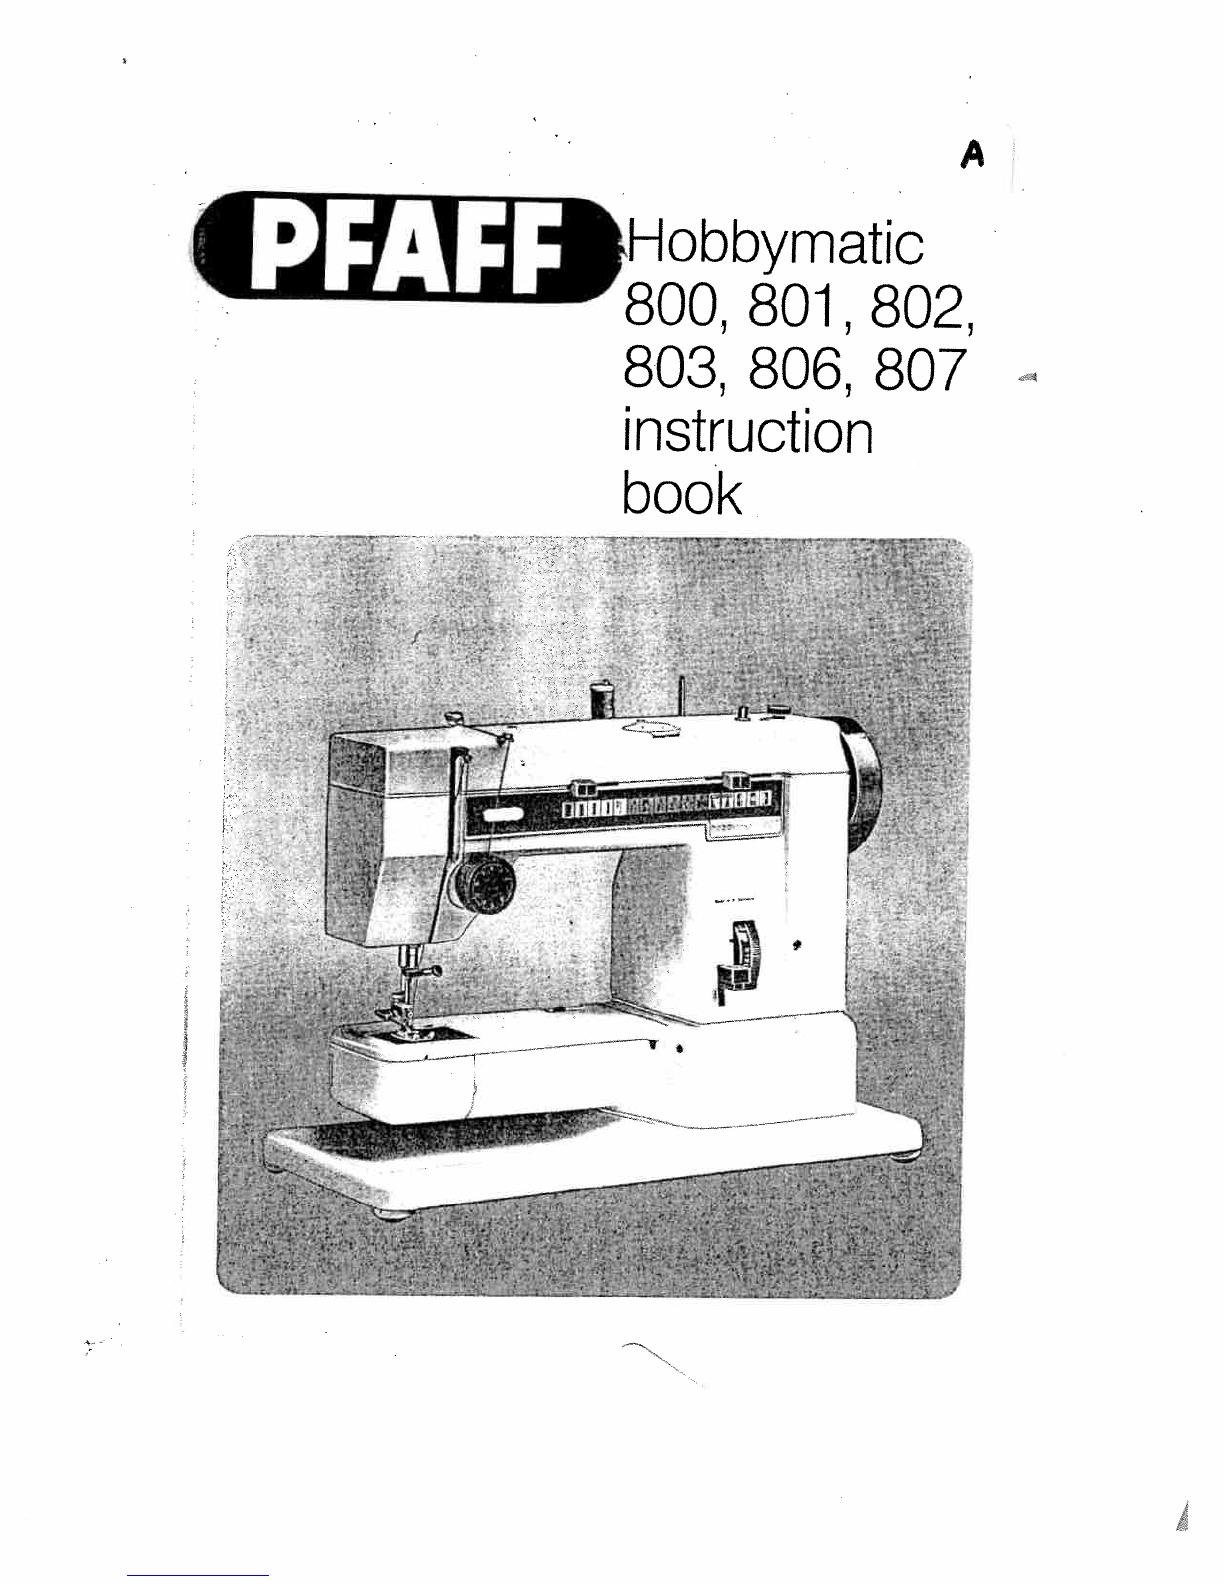 pfaff hobbymatic 803 bedienungsanleitung